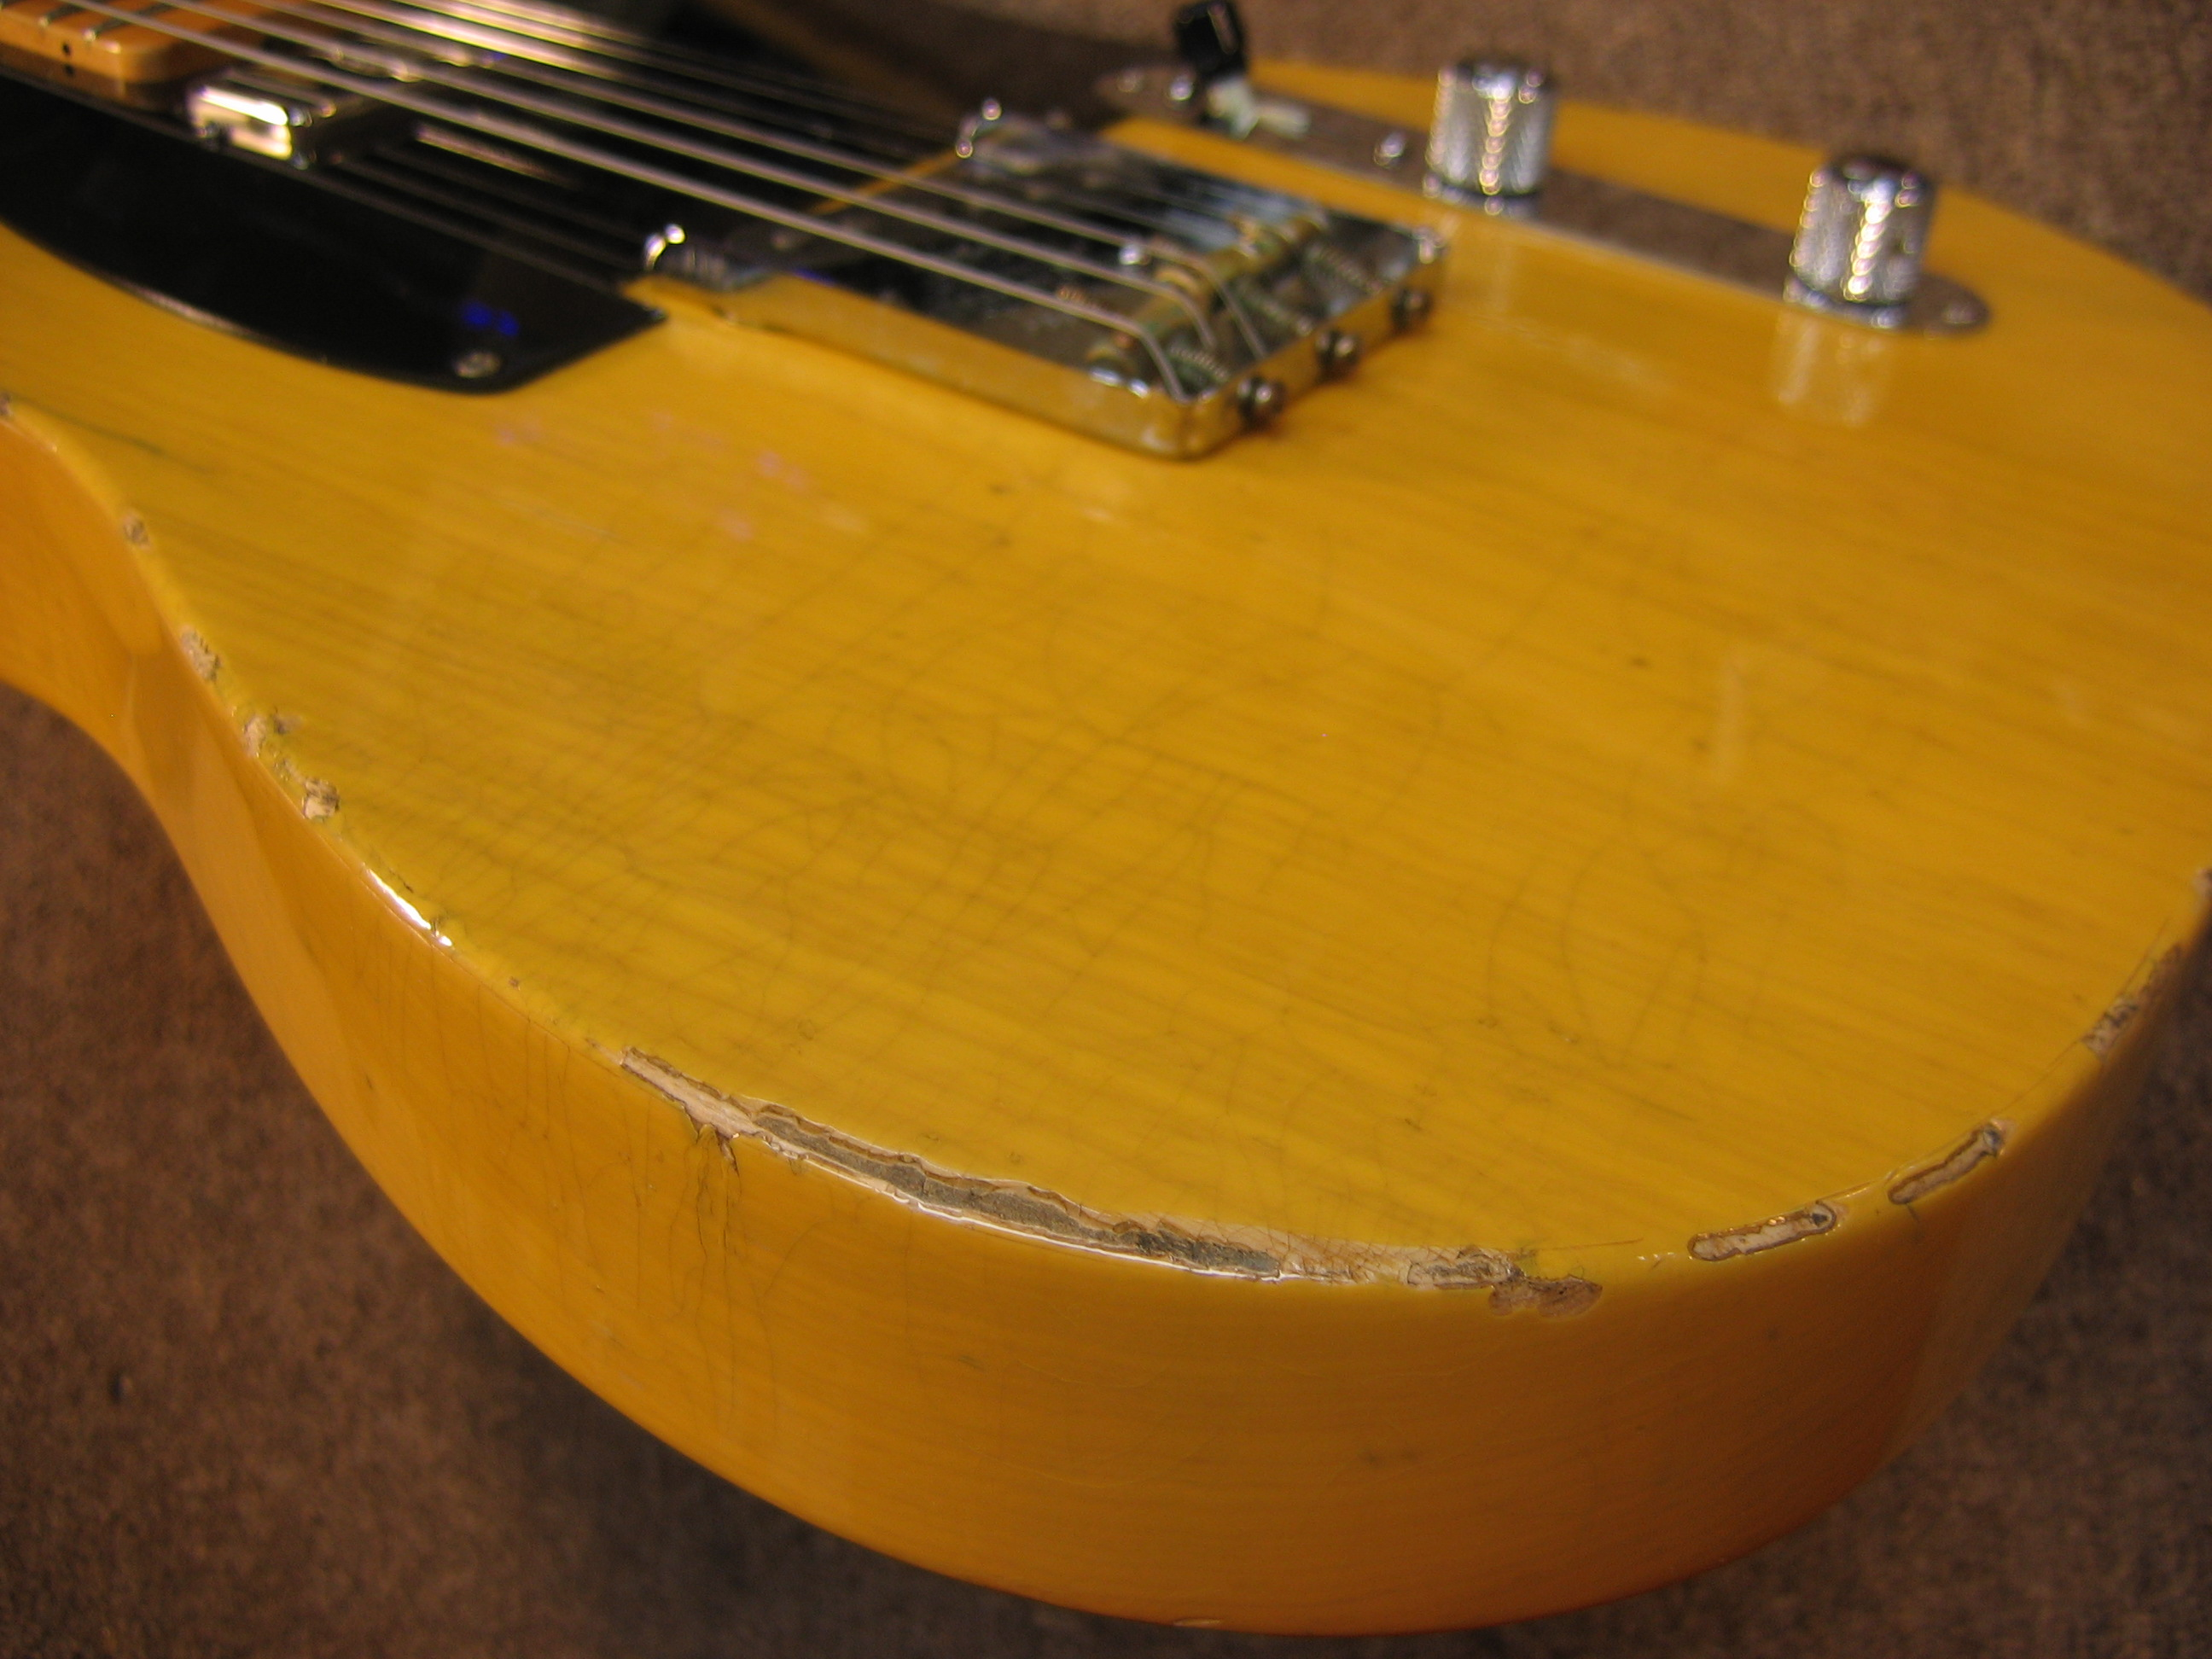 Blanco Aliviar Memorizar  52 Hot Rod Telecaster Relic   Chicago Fret Works - Guitar Repair